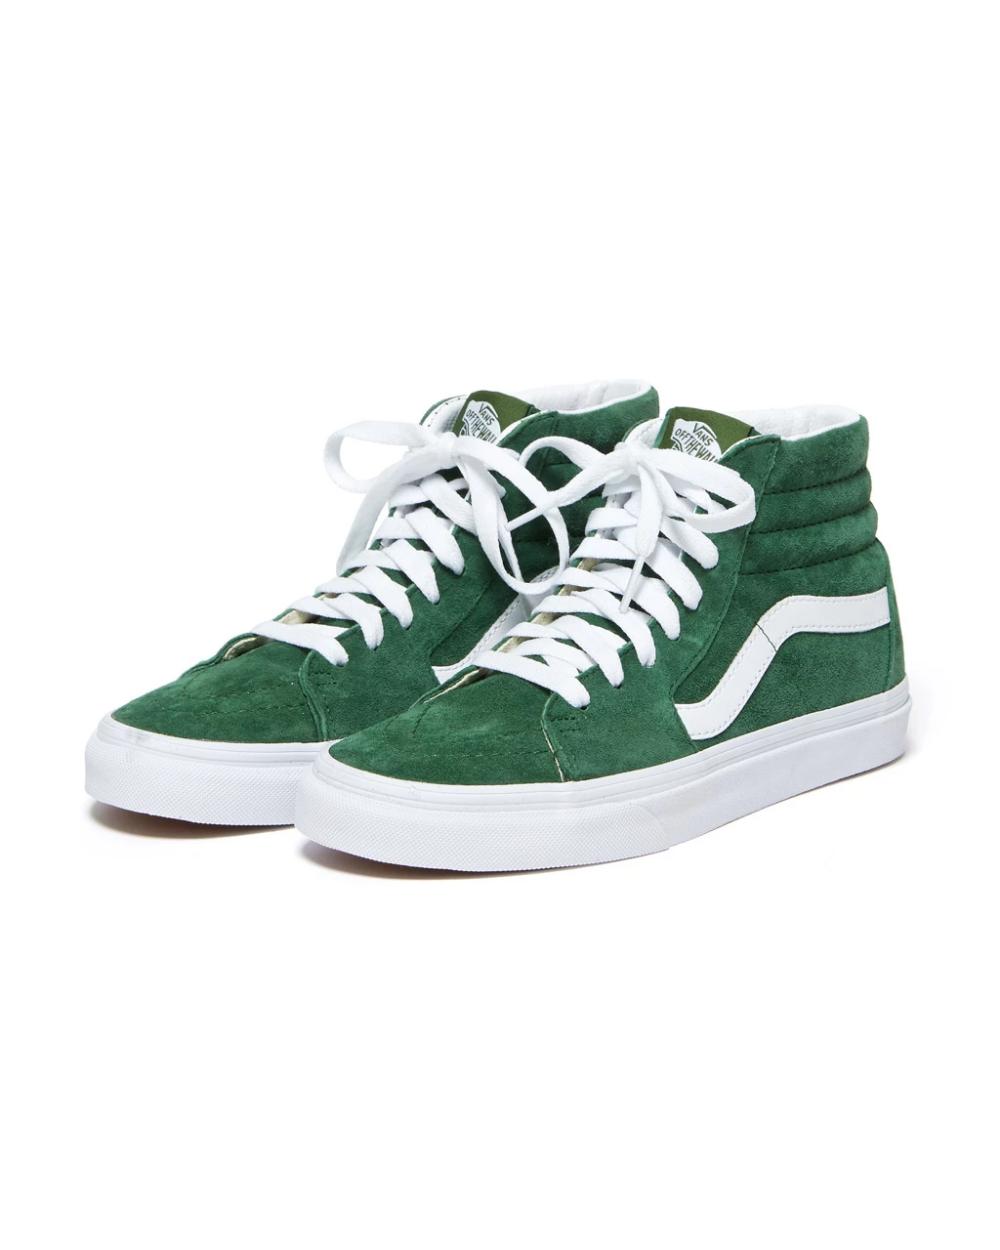 Sk8-Hi - Fairway Green by vans - shoes